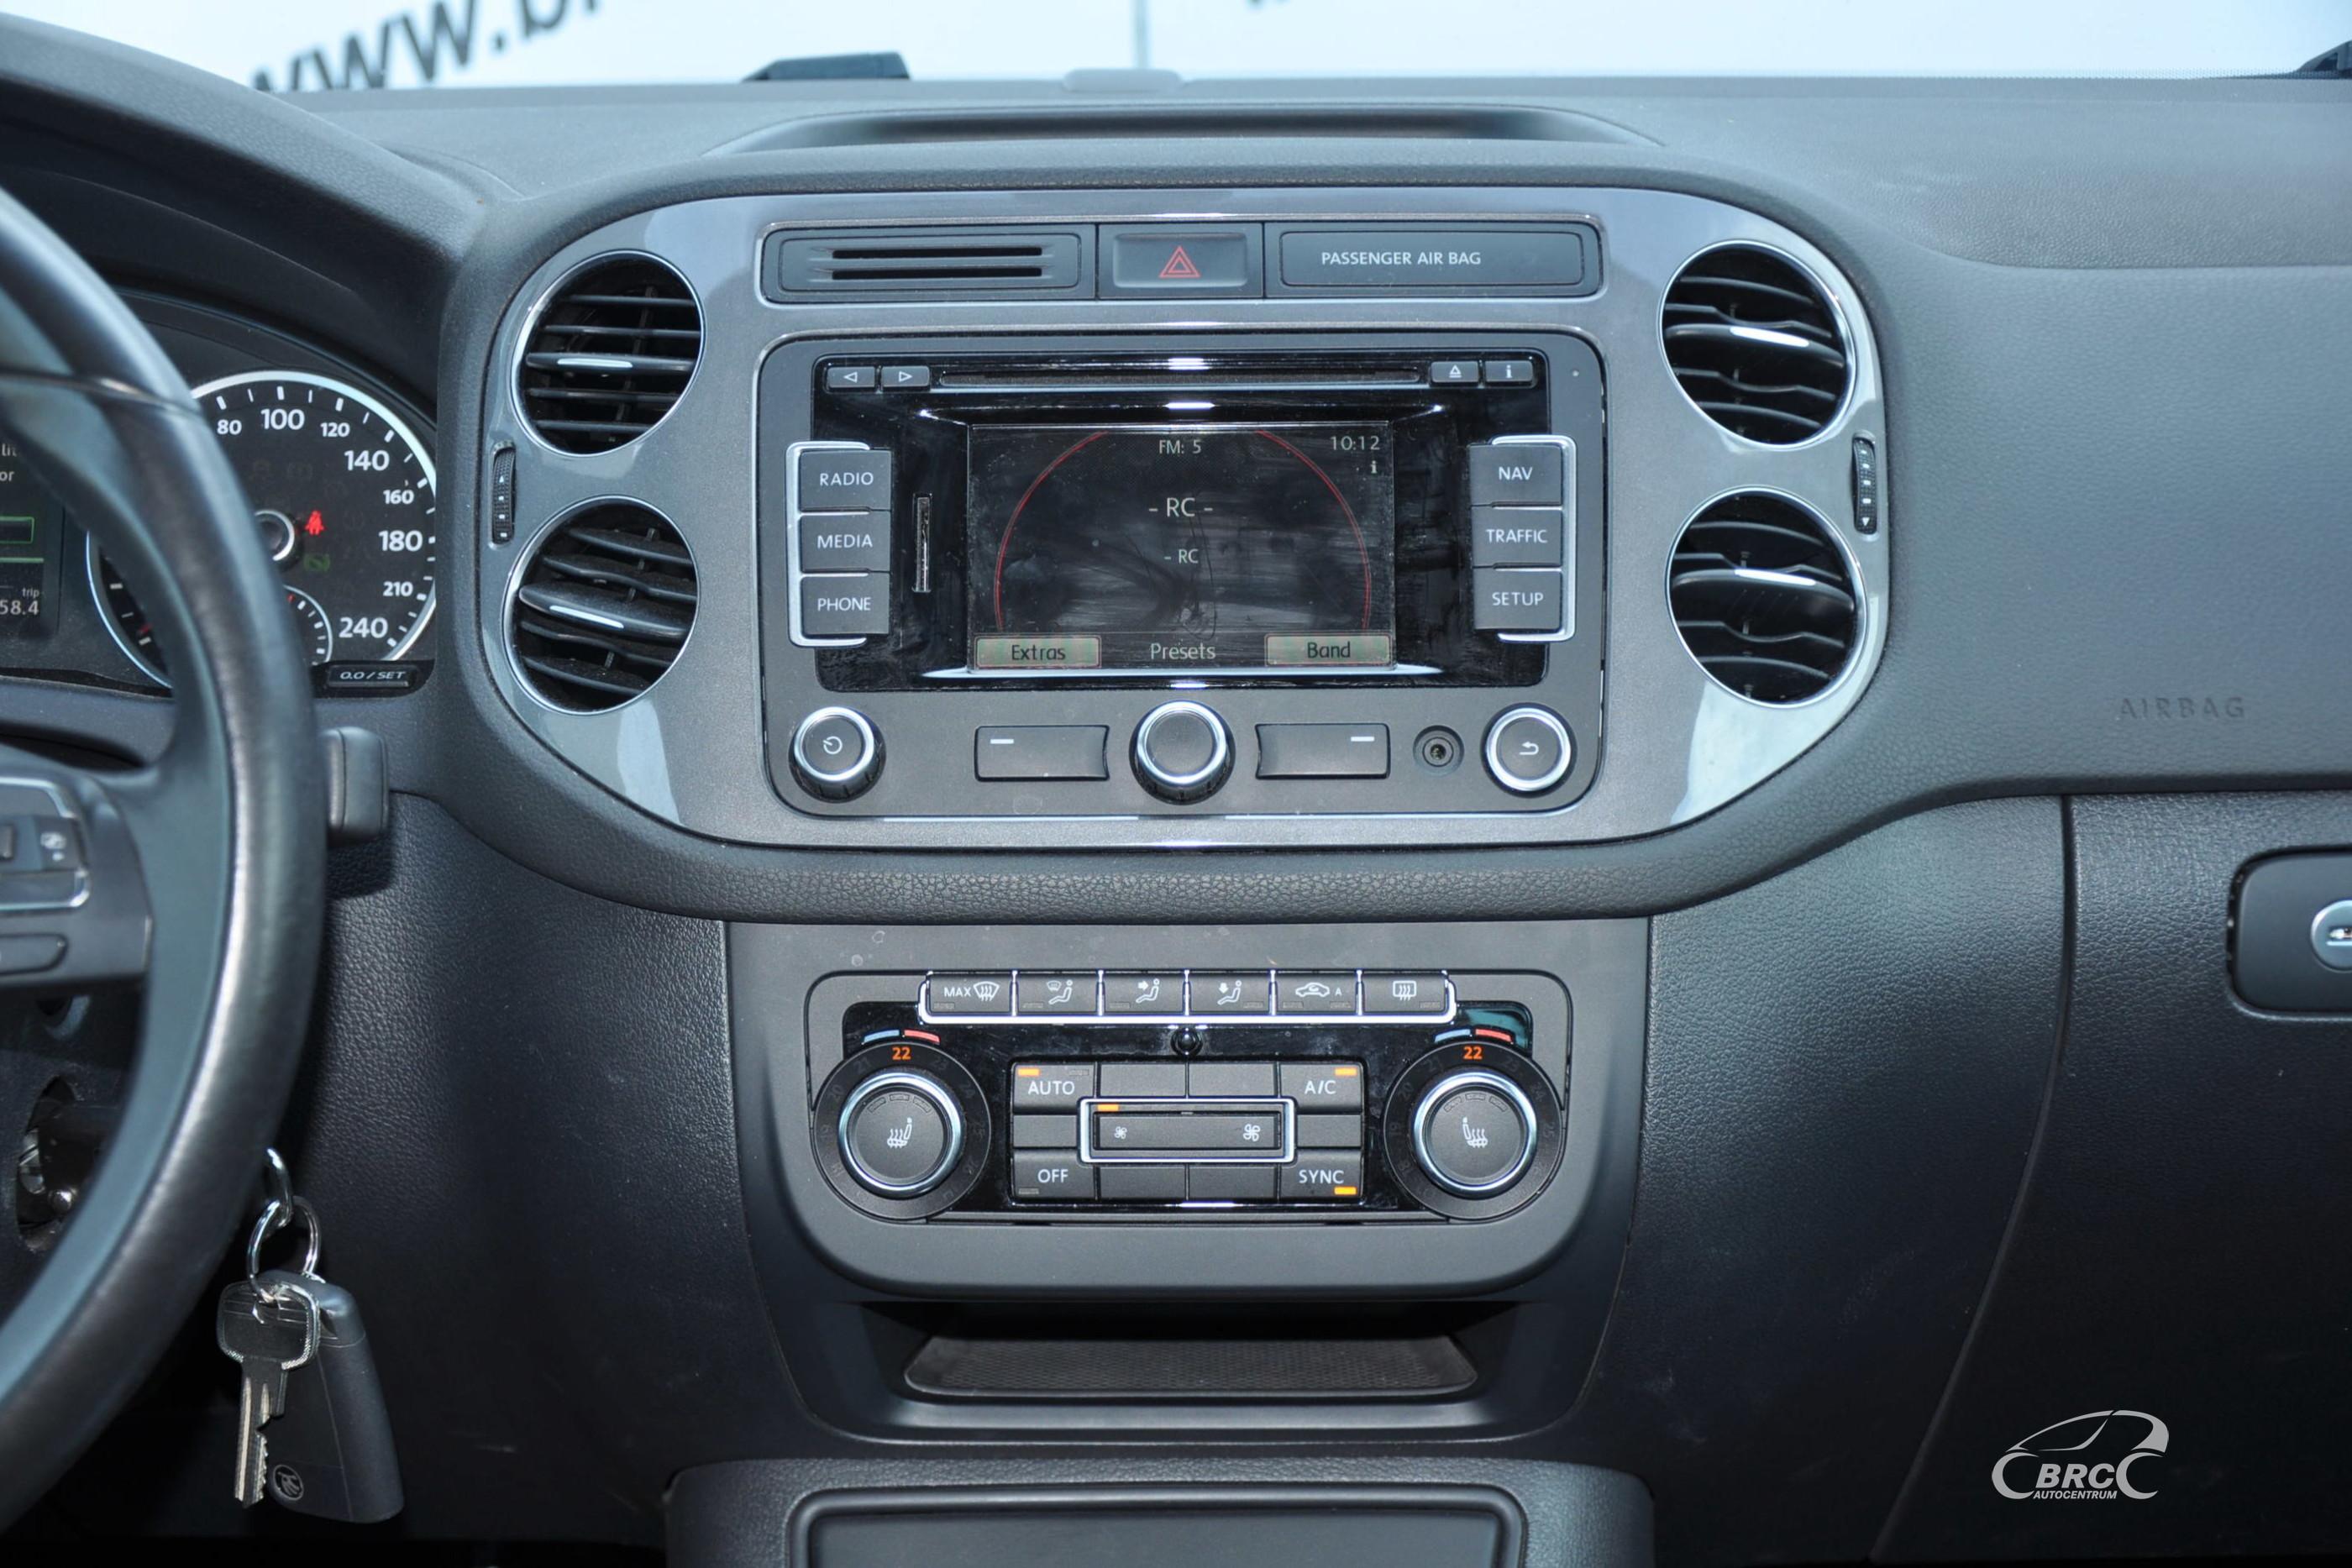 Volkswagen Tiguan 2.0 TDI 4MOTION Automatas